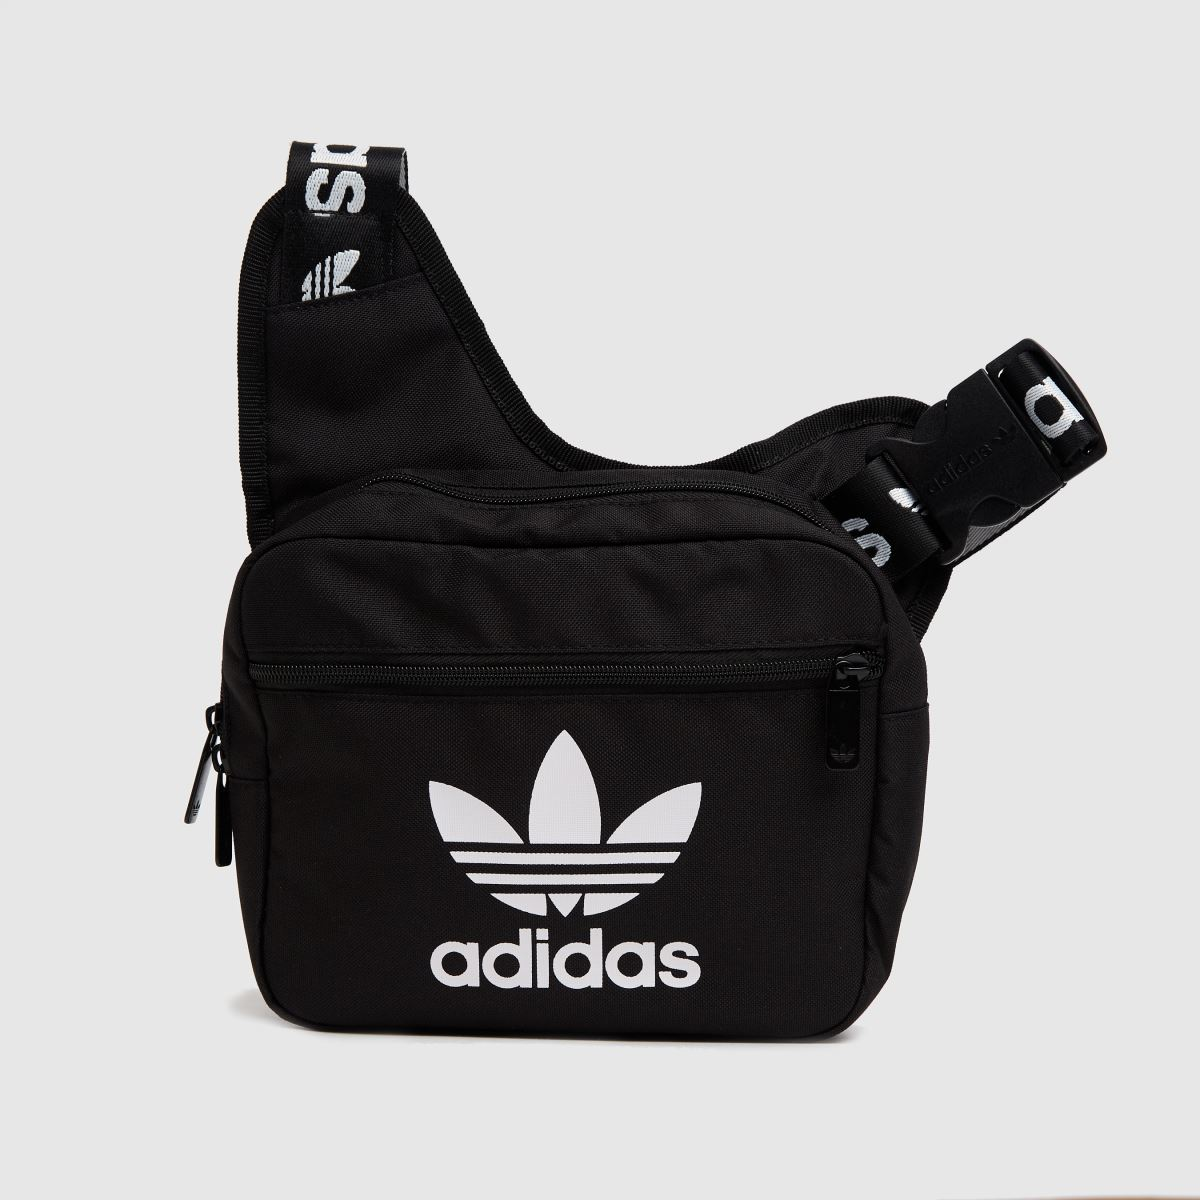 Adidas Black & White Sling Bag